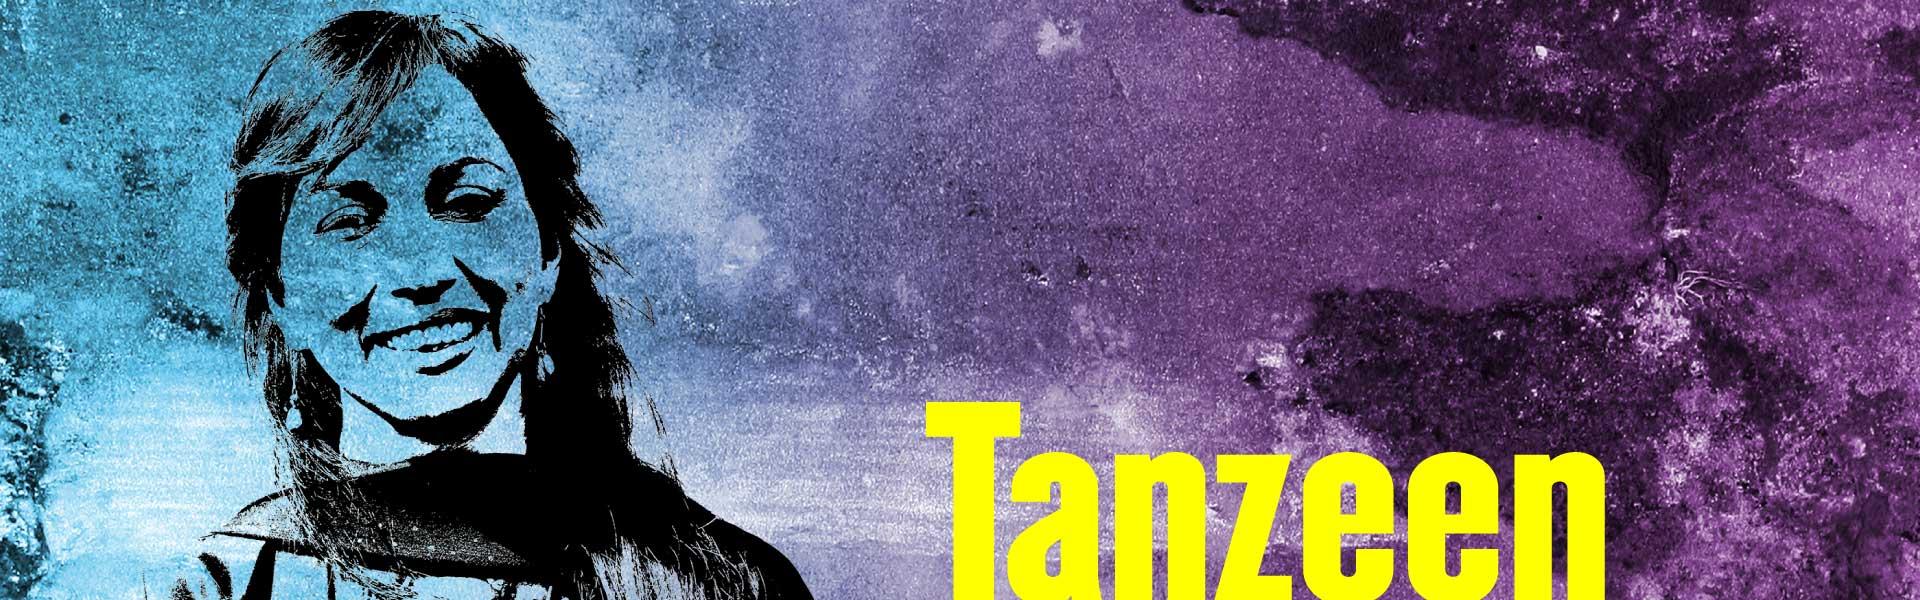 "<a href=""http://hiddenrochdale.co.uk/tanzeem/"">Tanzeem</a><br/><p>"